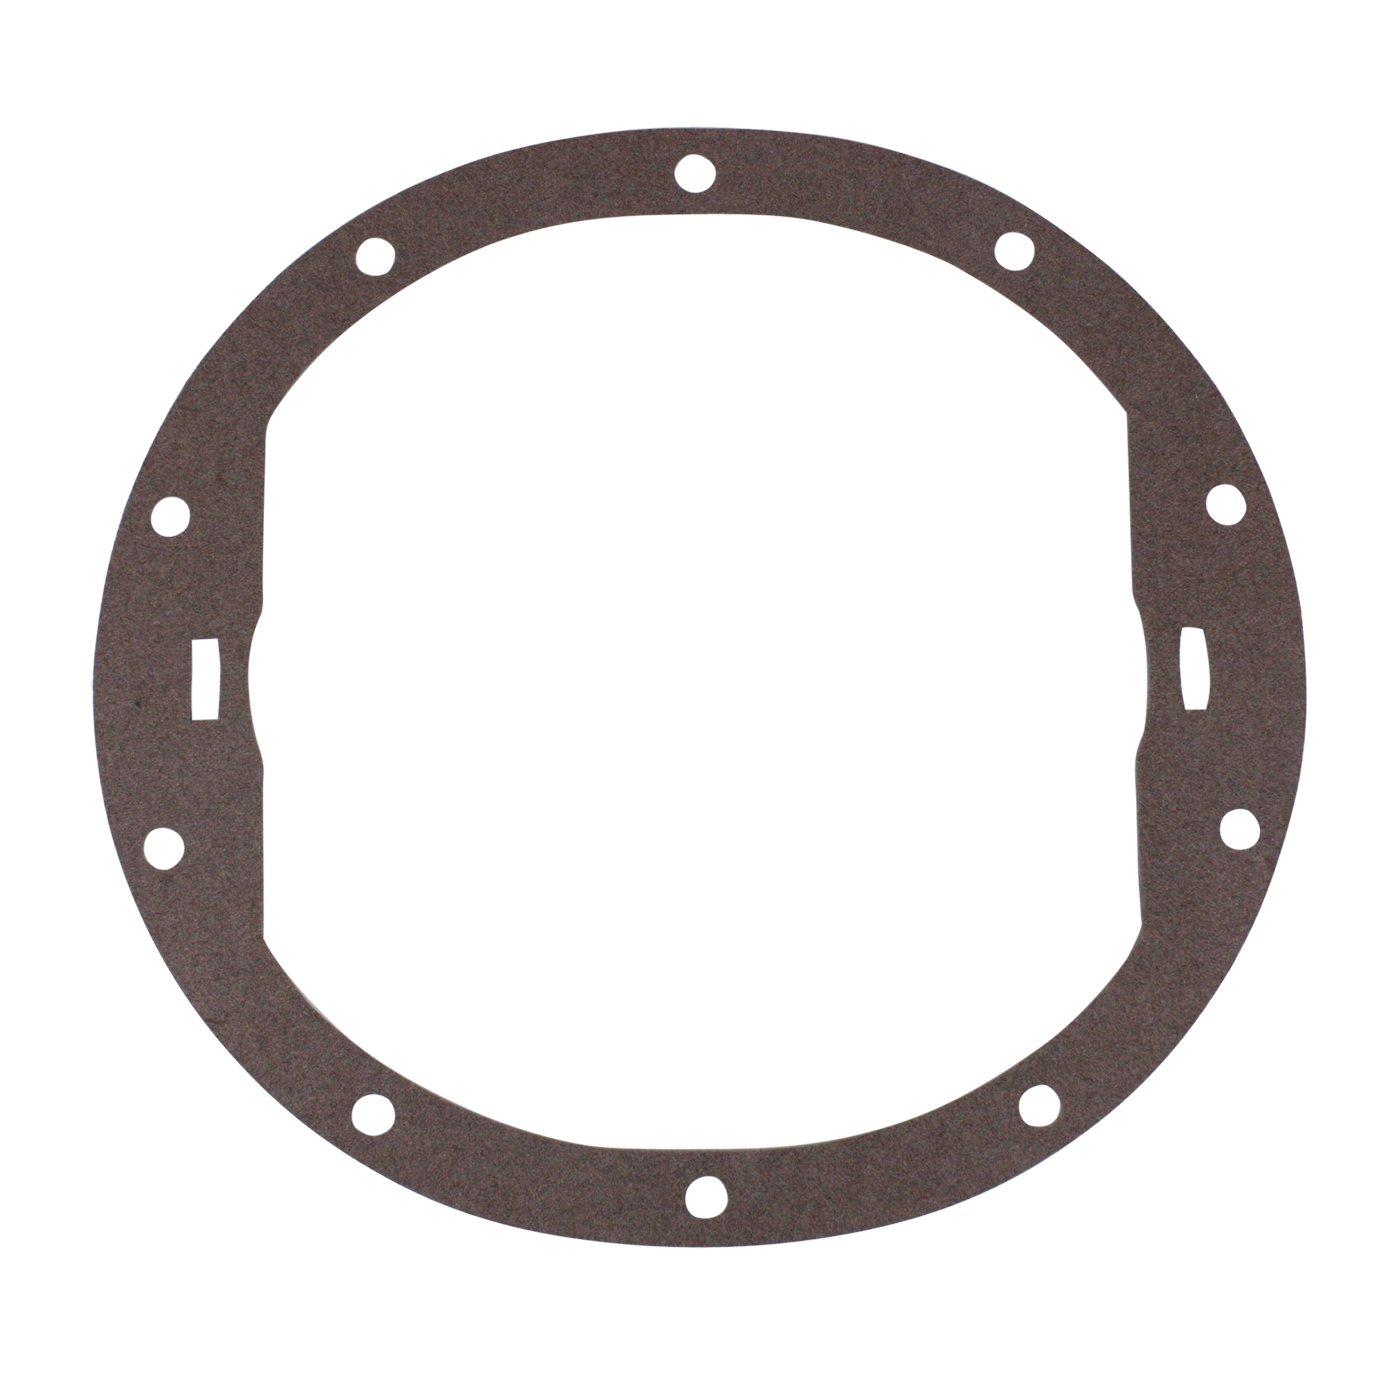 Yukon Gear & Axle (YCGGM8.5) Cover Gasket for GM 8.2/8.5 Rear Differential